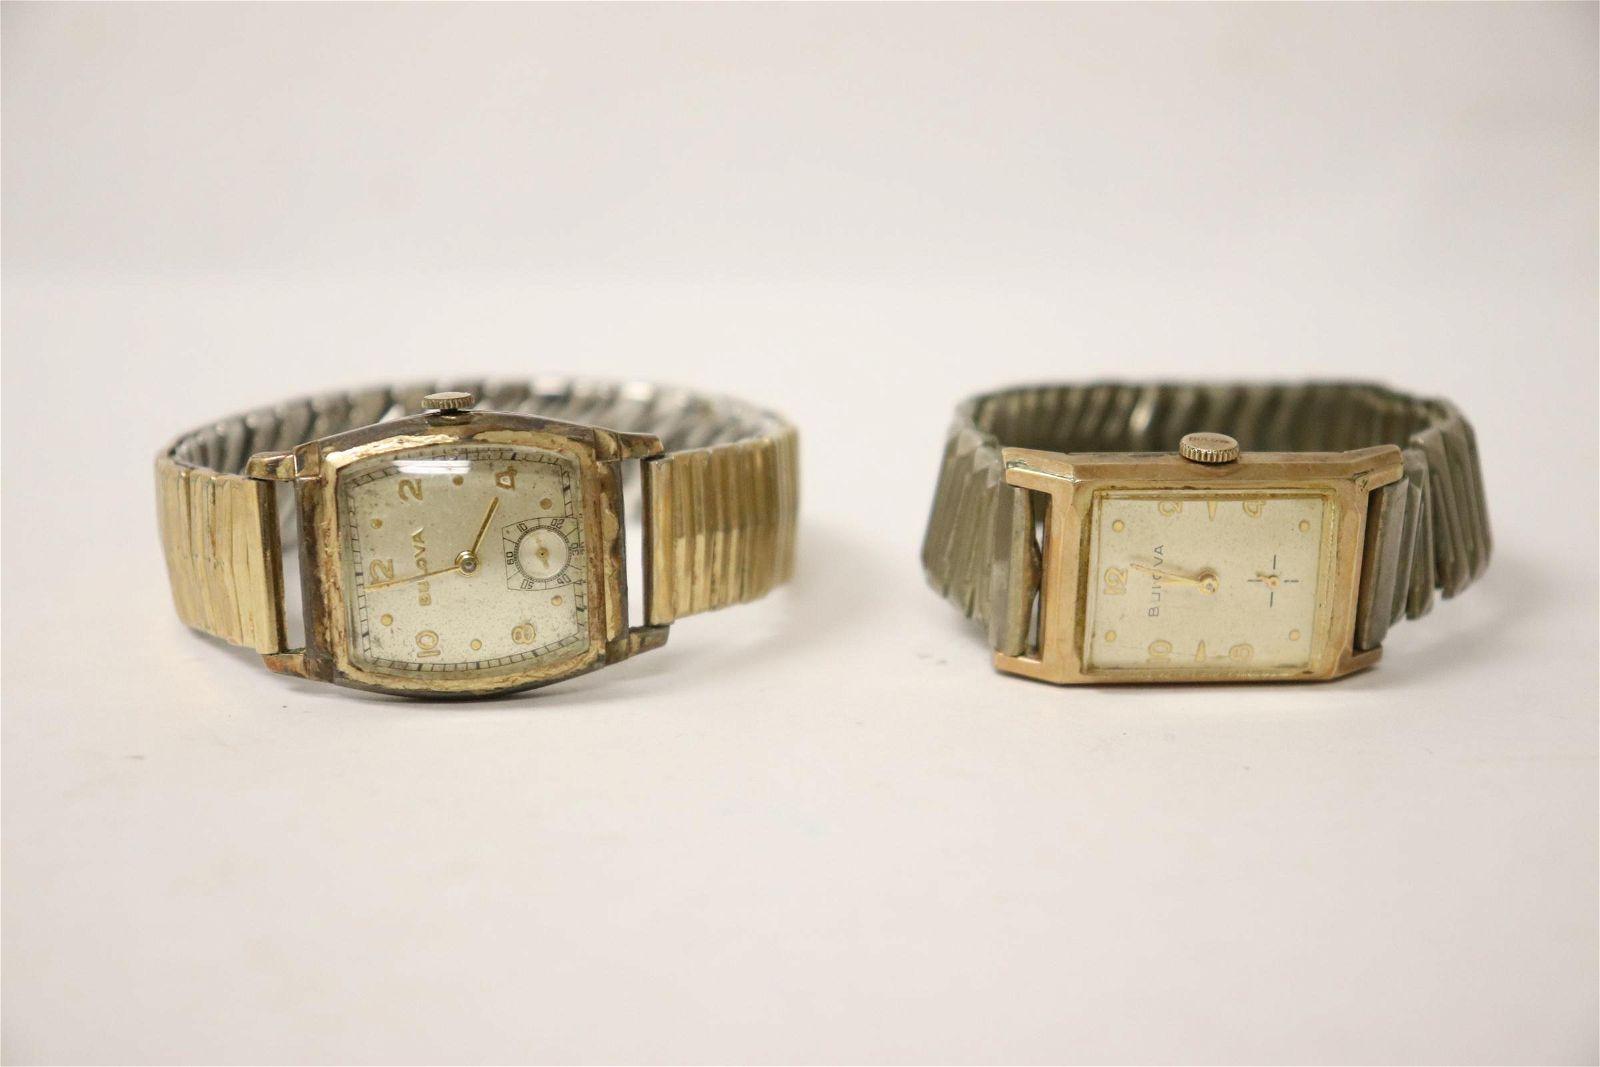 2 vintage bulova wrist watches